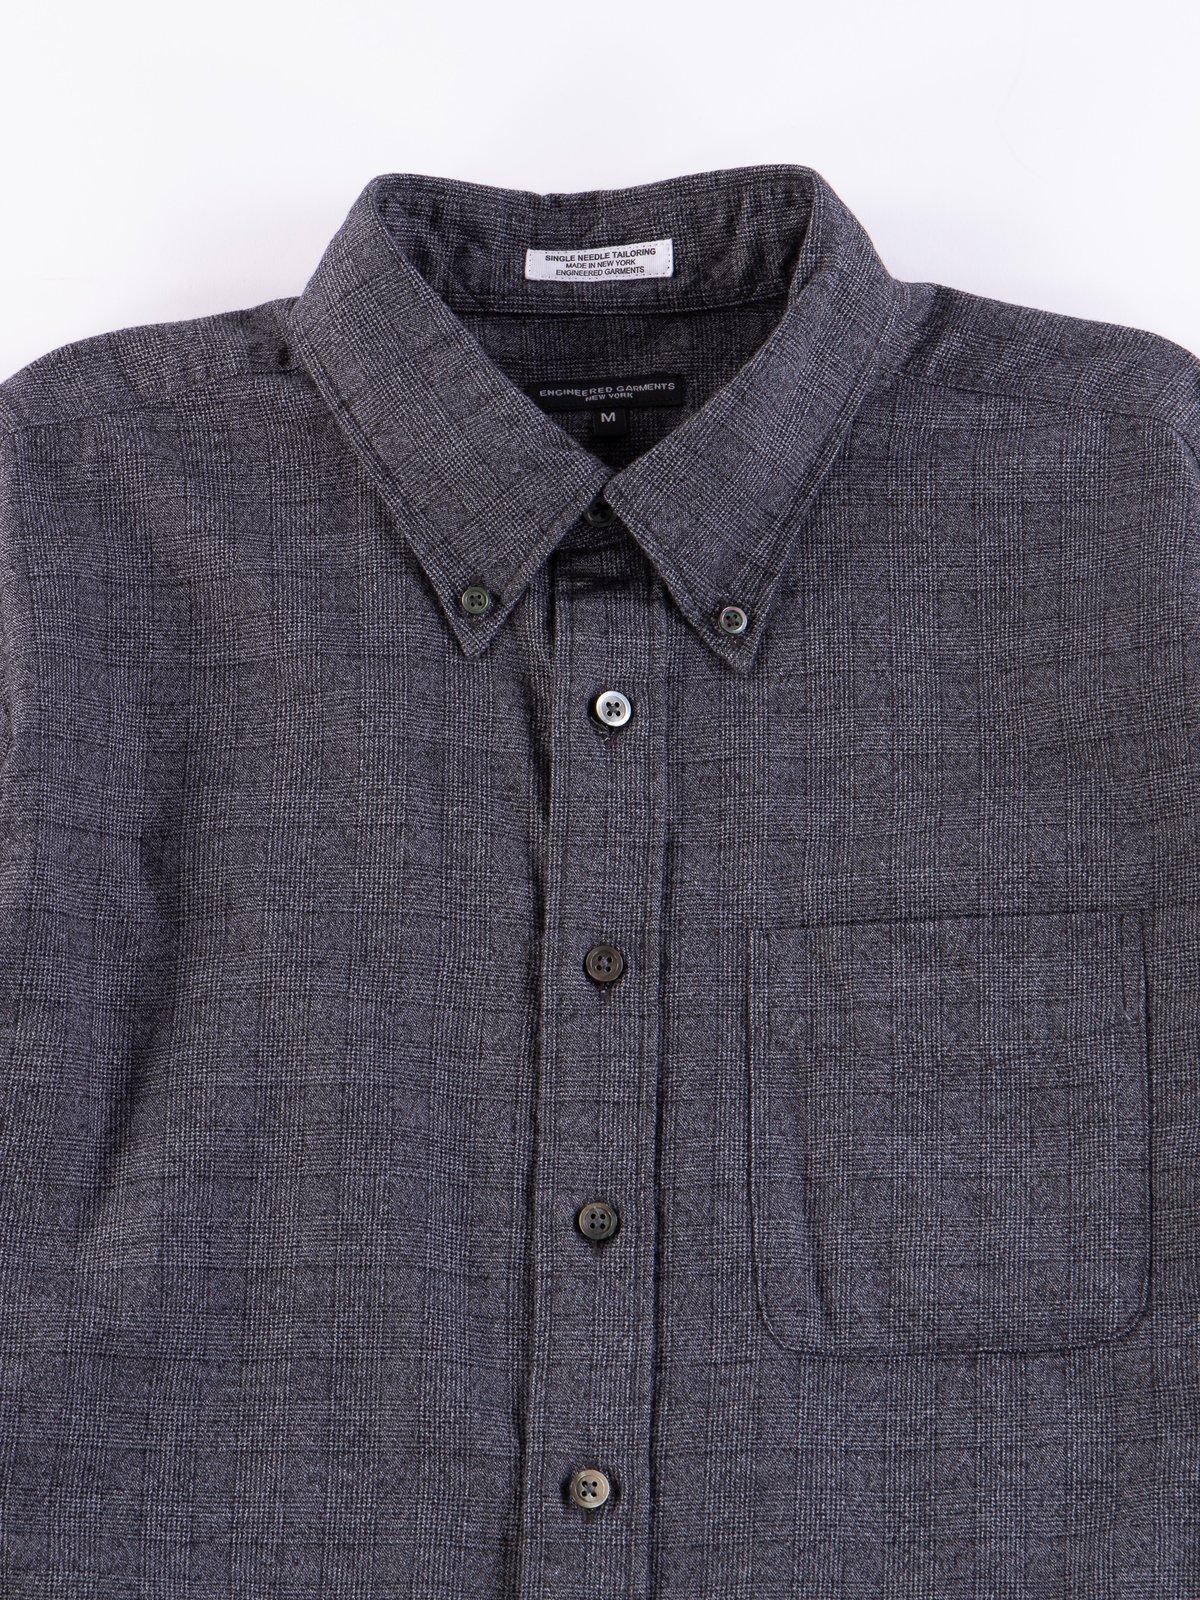 Grey Cotton Glen Plaid 19th Century BD Shirt - Image 3